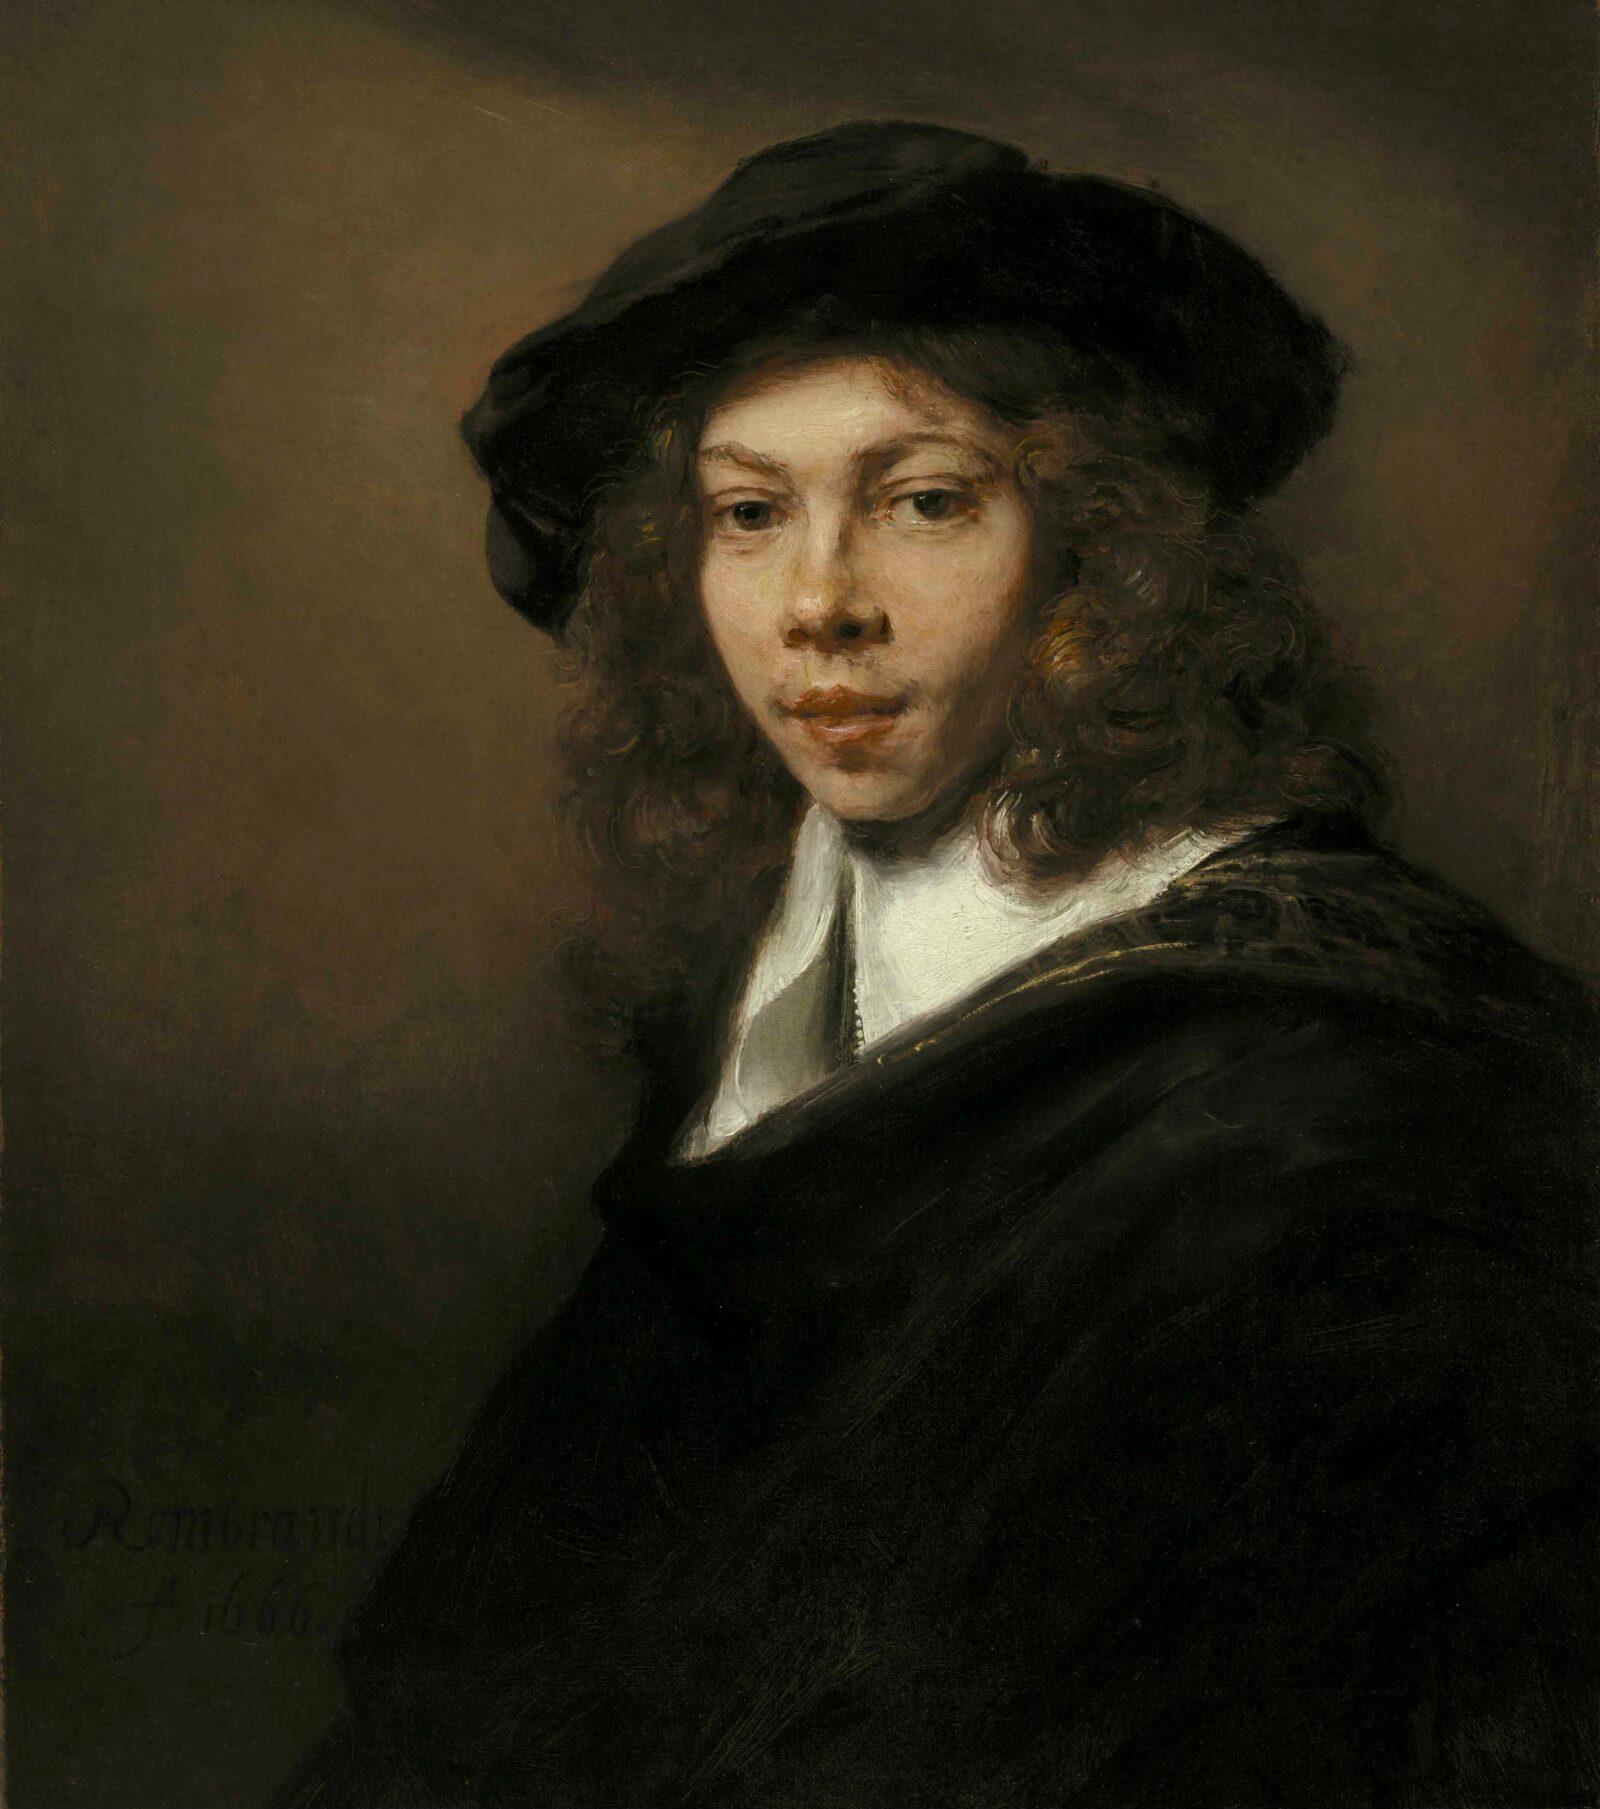 Rembrandt van Rijn (1606-1669), Young Man in a Black Beret, ca. 1662 Nelson Atkins Museum, Kansas City